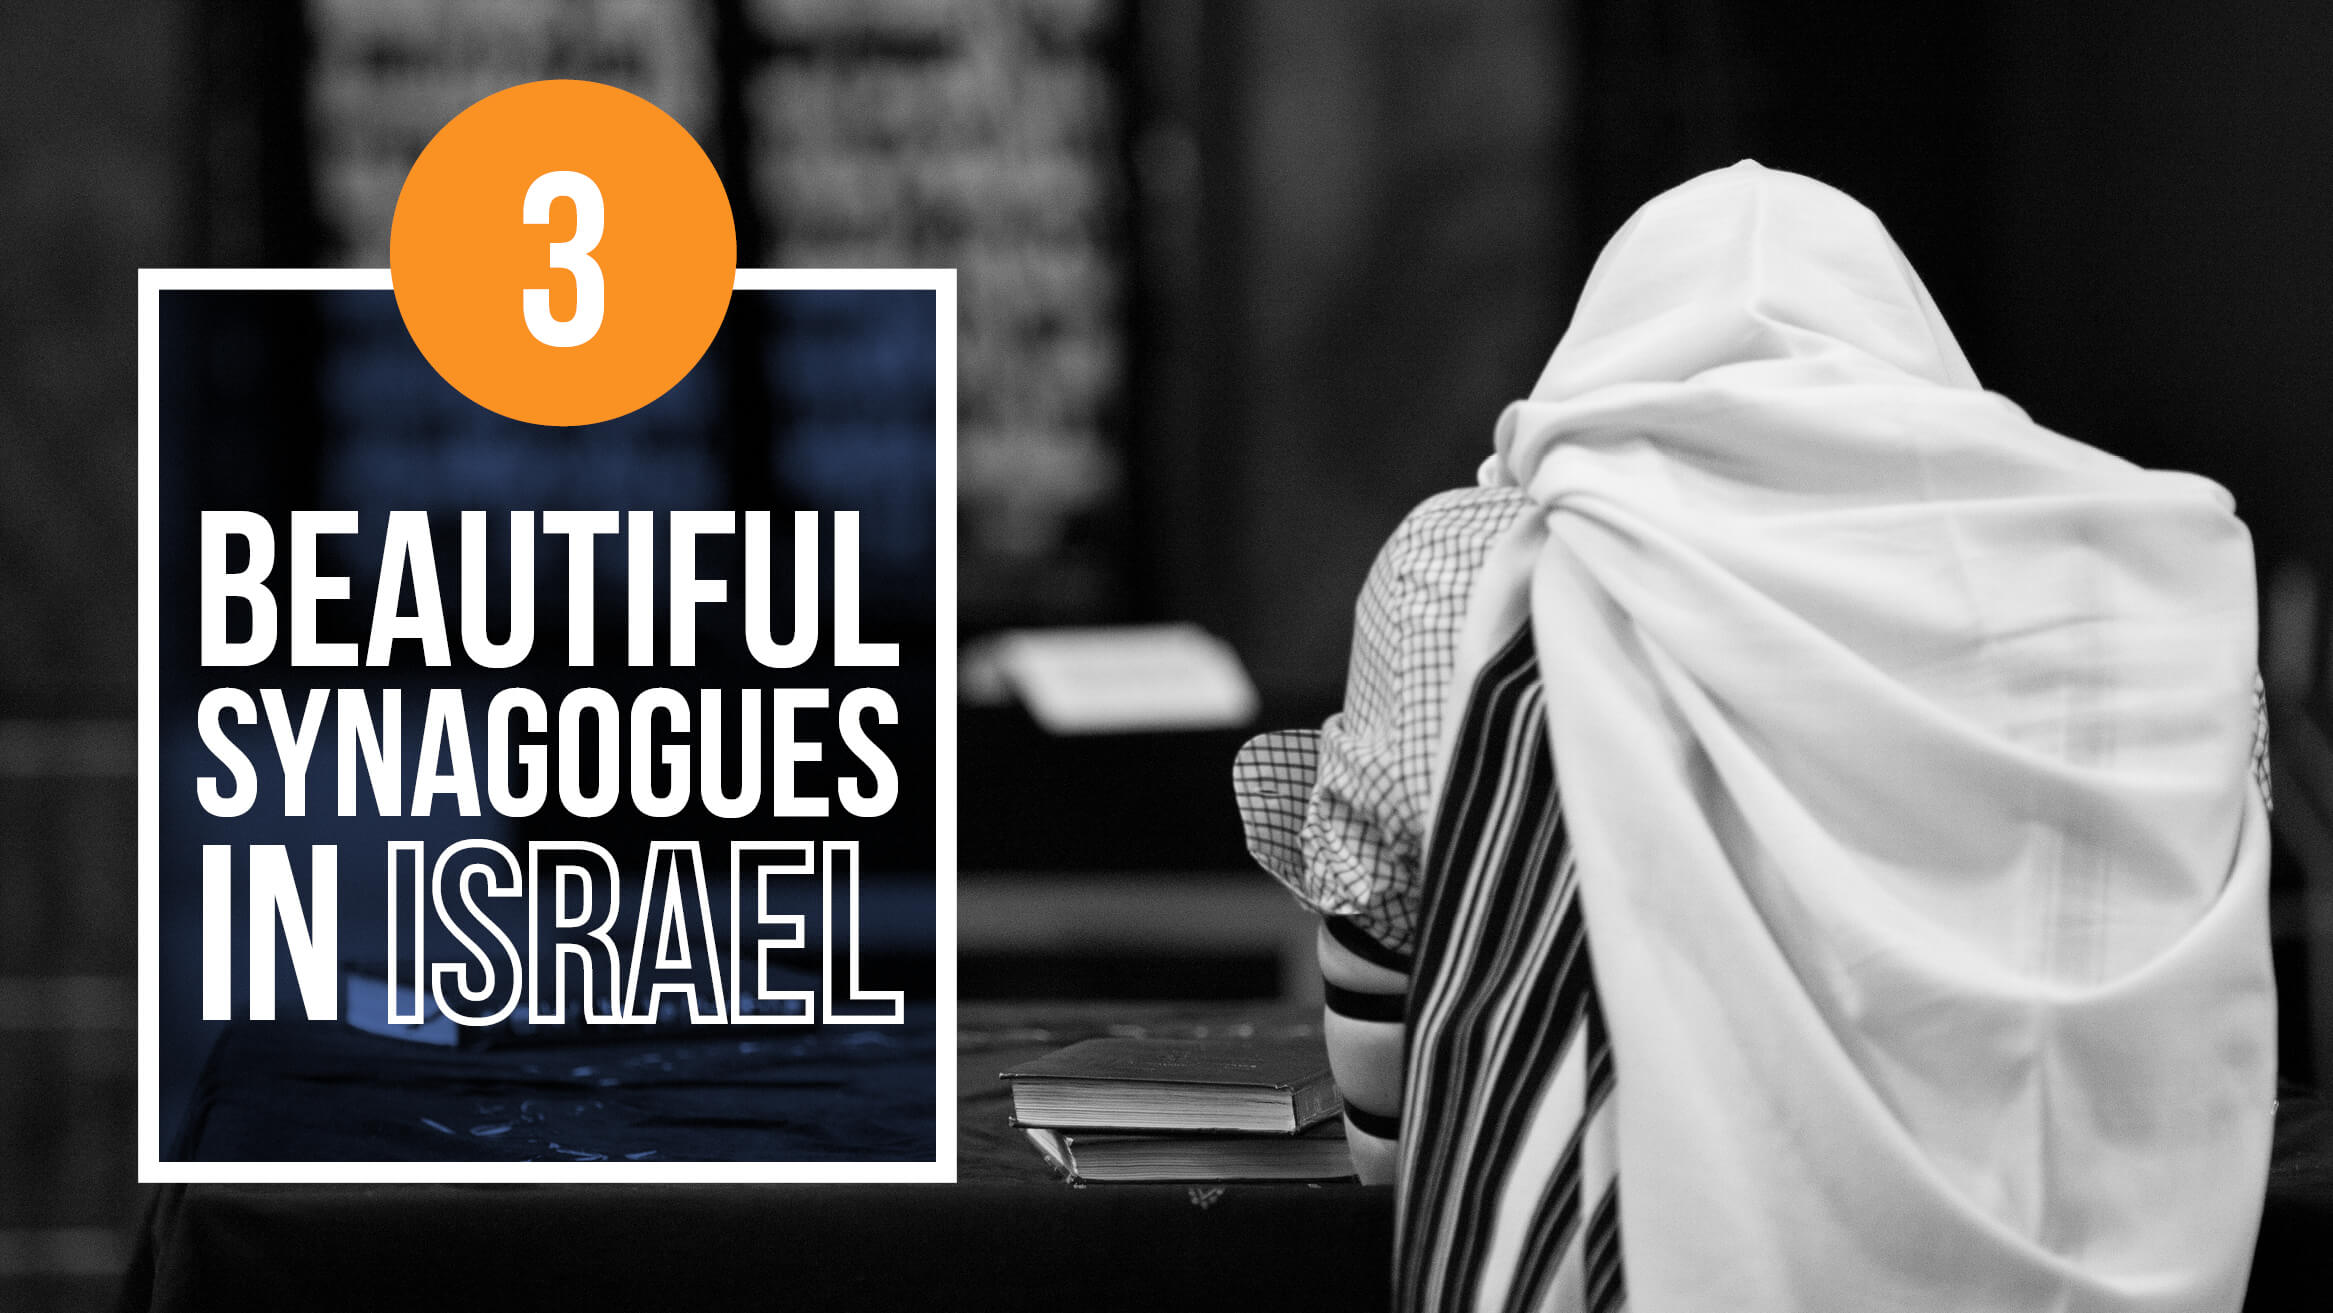 3 Beautiful Synagogues in Israel header